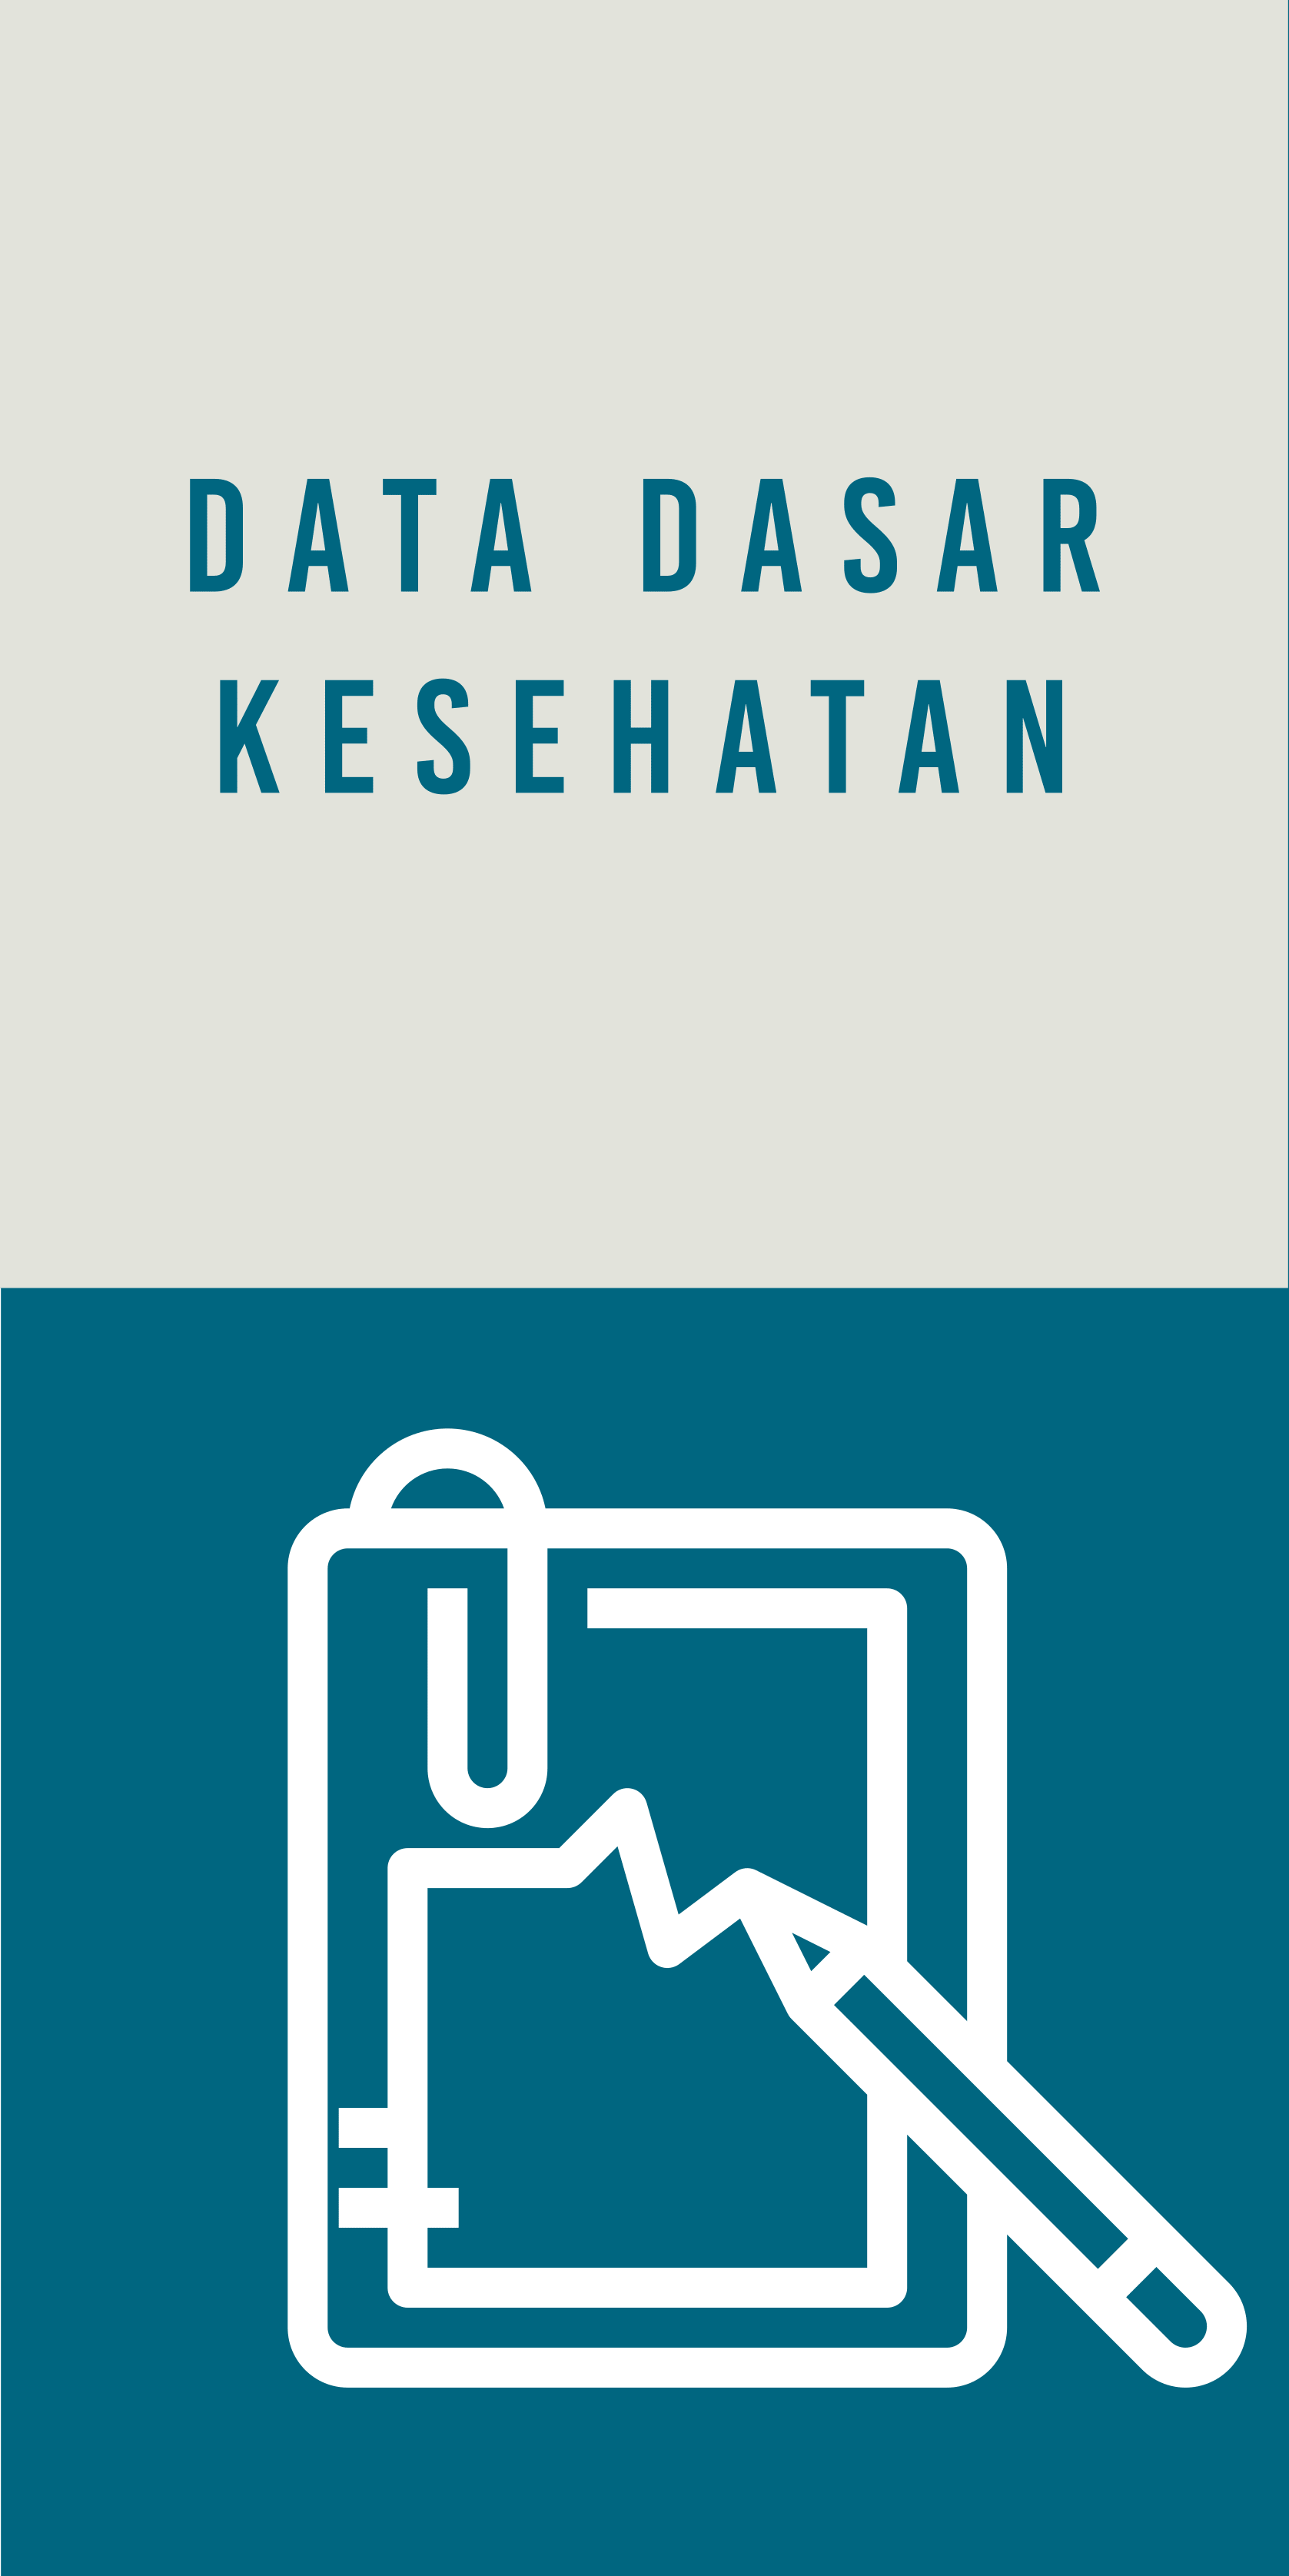 The Kite Map Logo